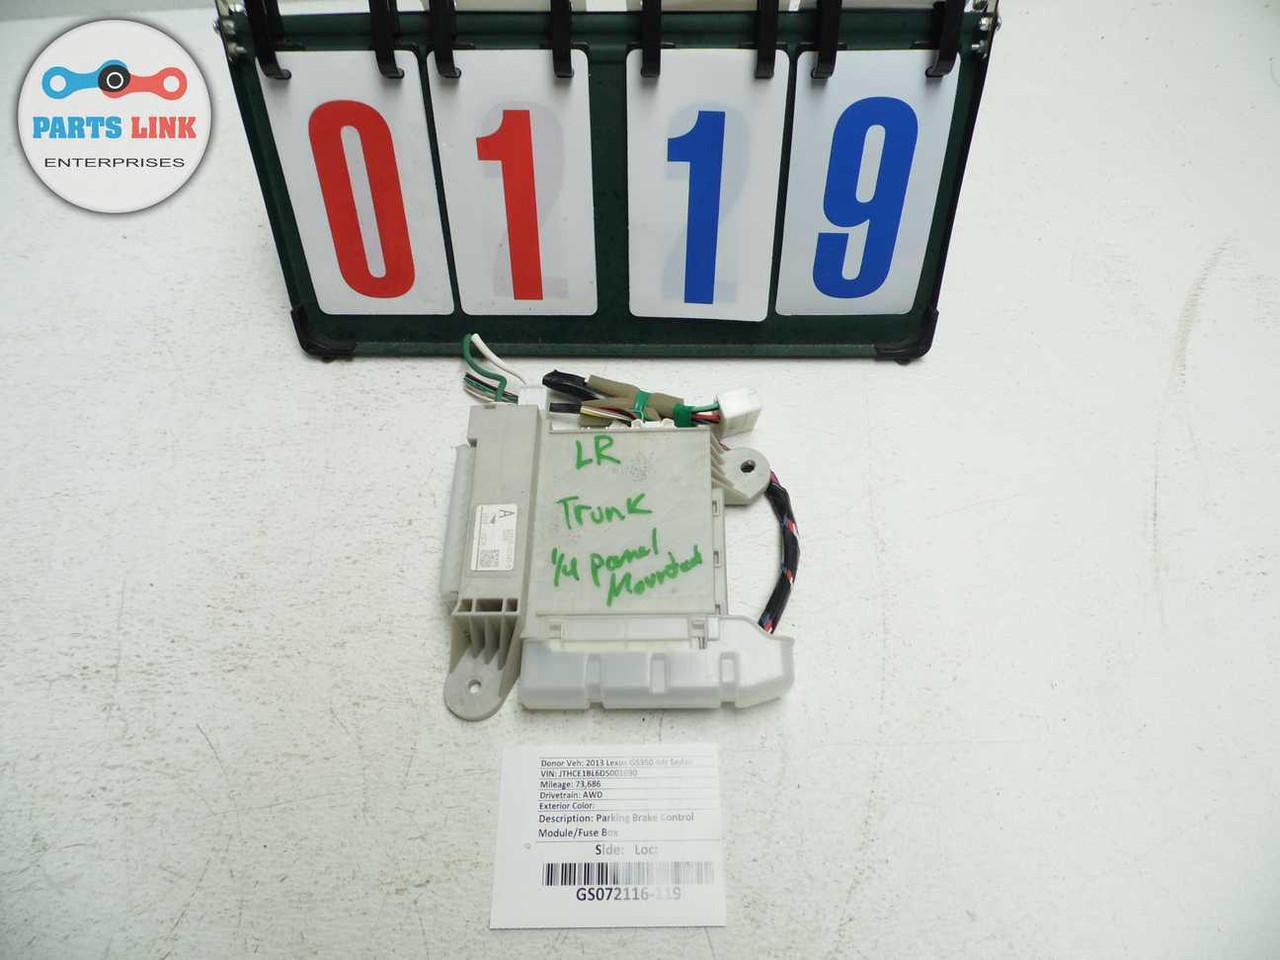 lexus gs350 awd parking brake control module relay junction block fuse box oem image 1 [ 1280 x 960 Pixel ]